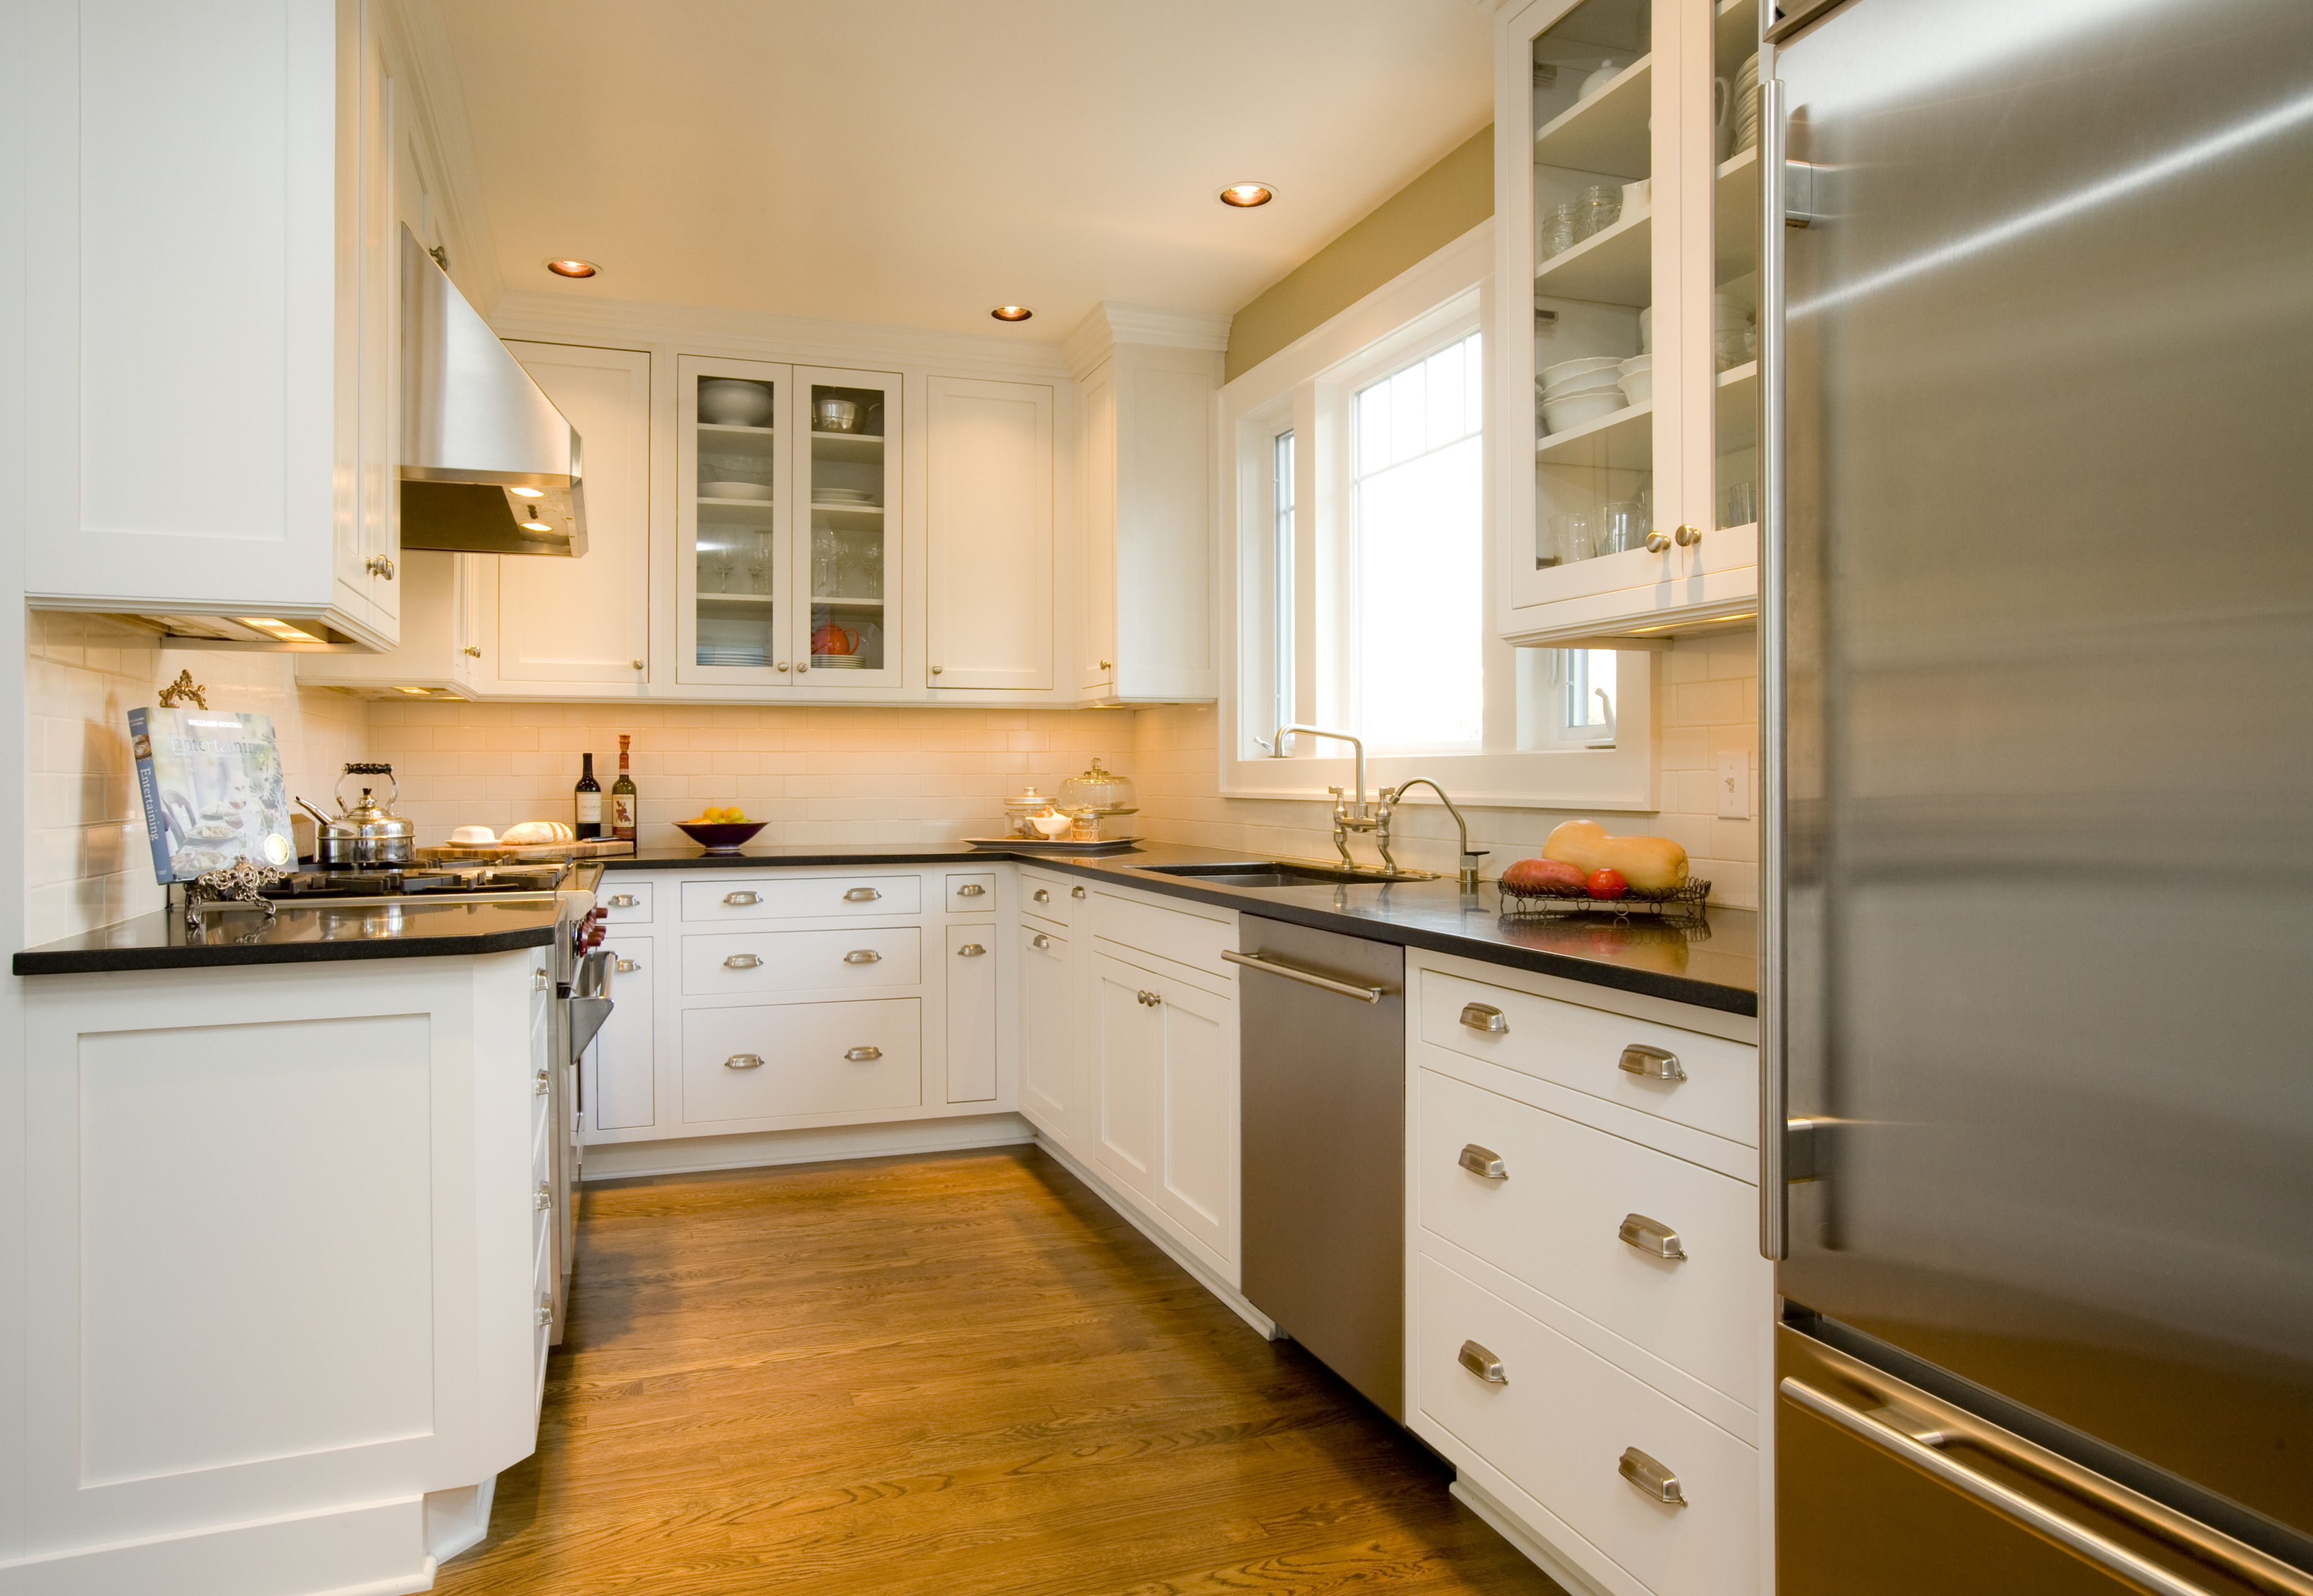 Home decorating new england style Pesquisa Google Casas